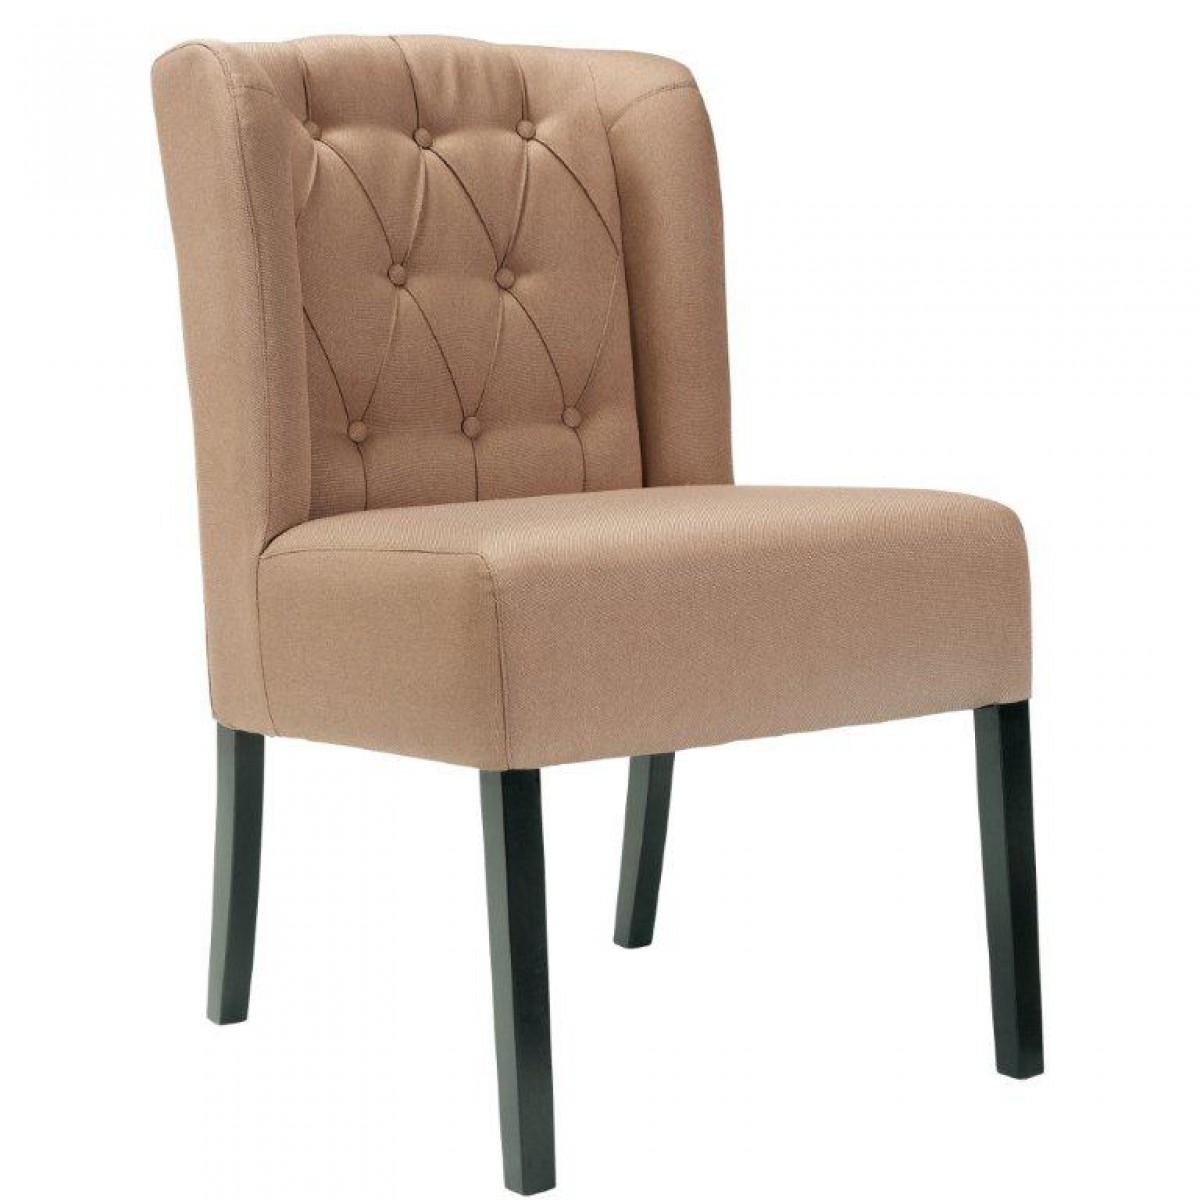 Arizona-eetkamerstoel-stoel-stof-bahama-capitons